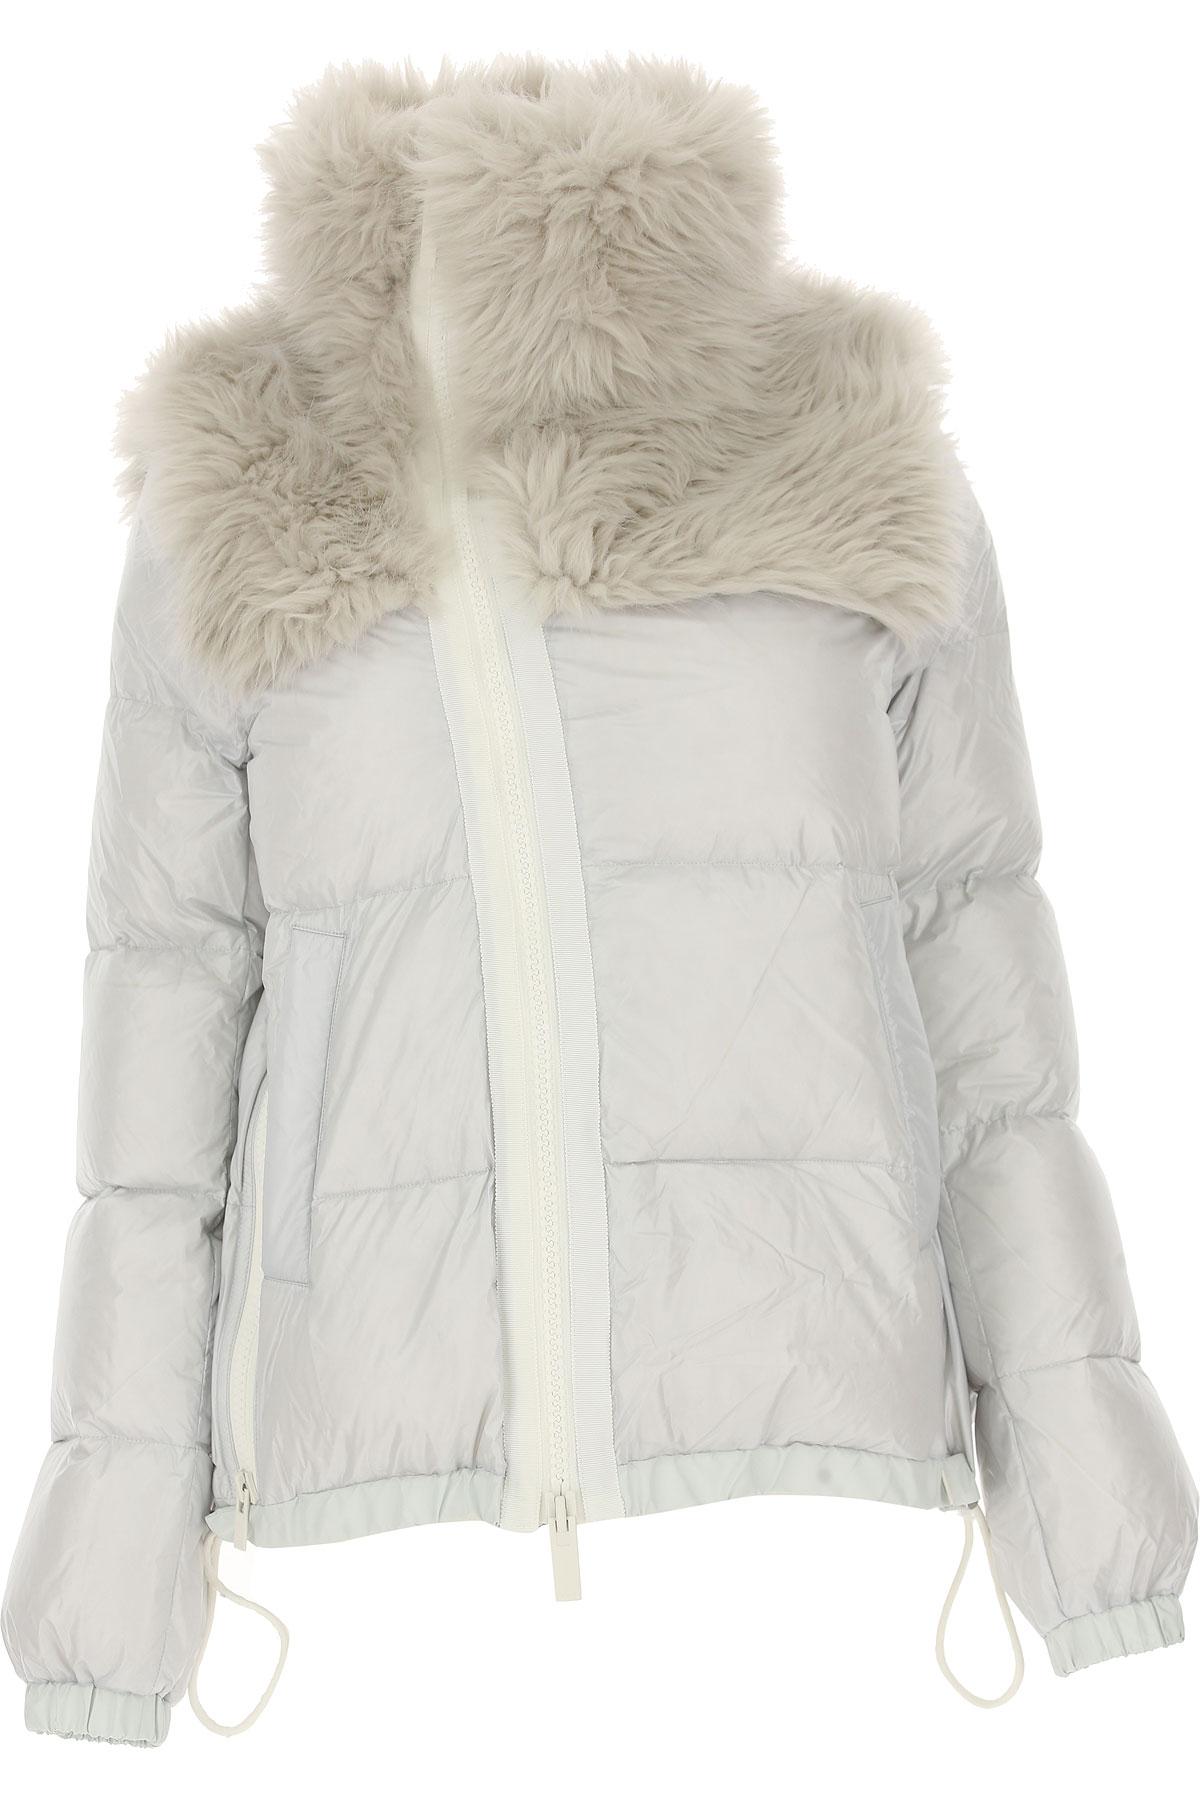 Image of Sacai Down Jacket for Women, Puffer Ski Jacket, Light Grey, polyester, 2017, US 0 - UK 4 - EU 34 - IT 38 US 2 - UK 6 - EU 36 - IT 40 US 4 - UK 8 - EU 38 - IT 42 US 6 - UK 10 - EU 40 - IT 44